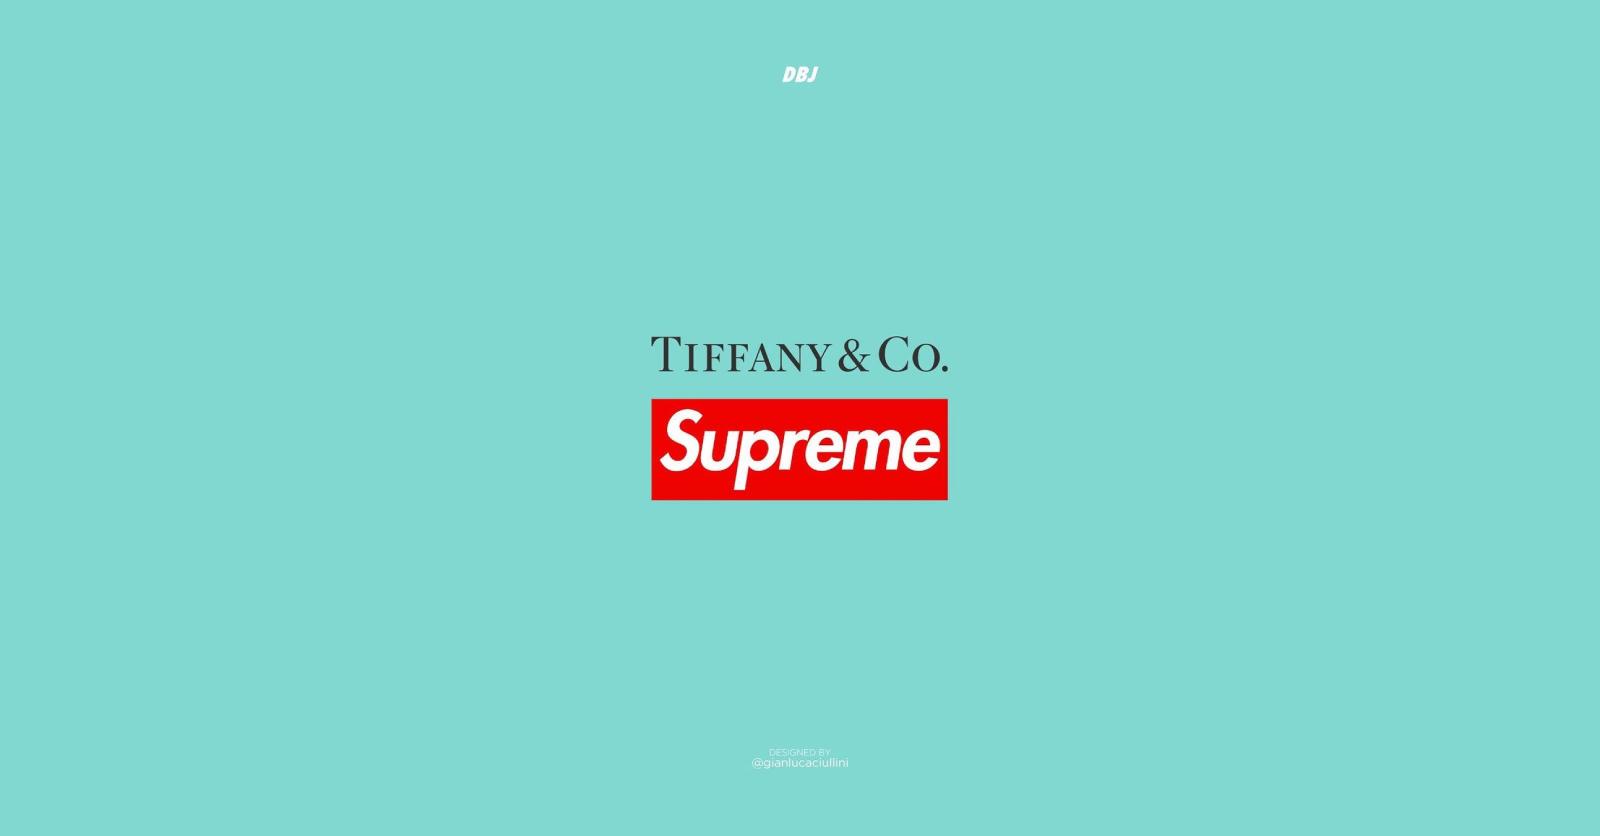 Supreme x Tiffany & Co.: Why the collaboration would make sense